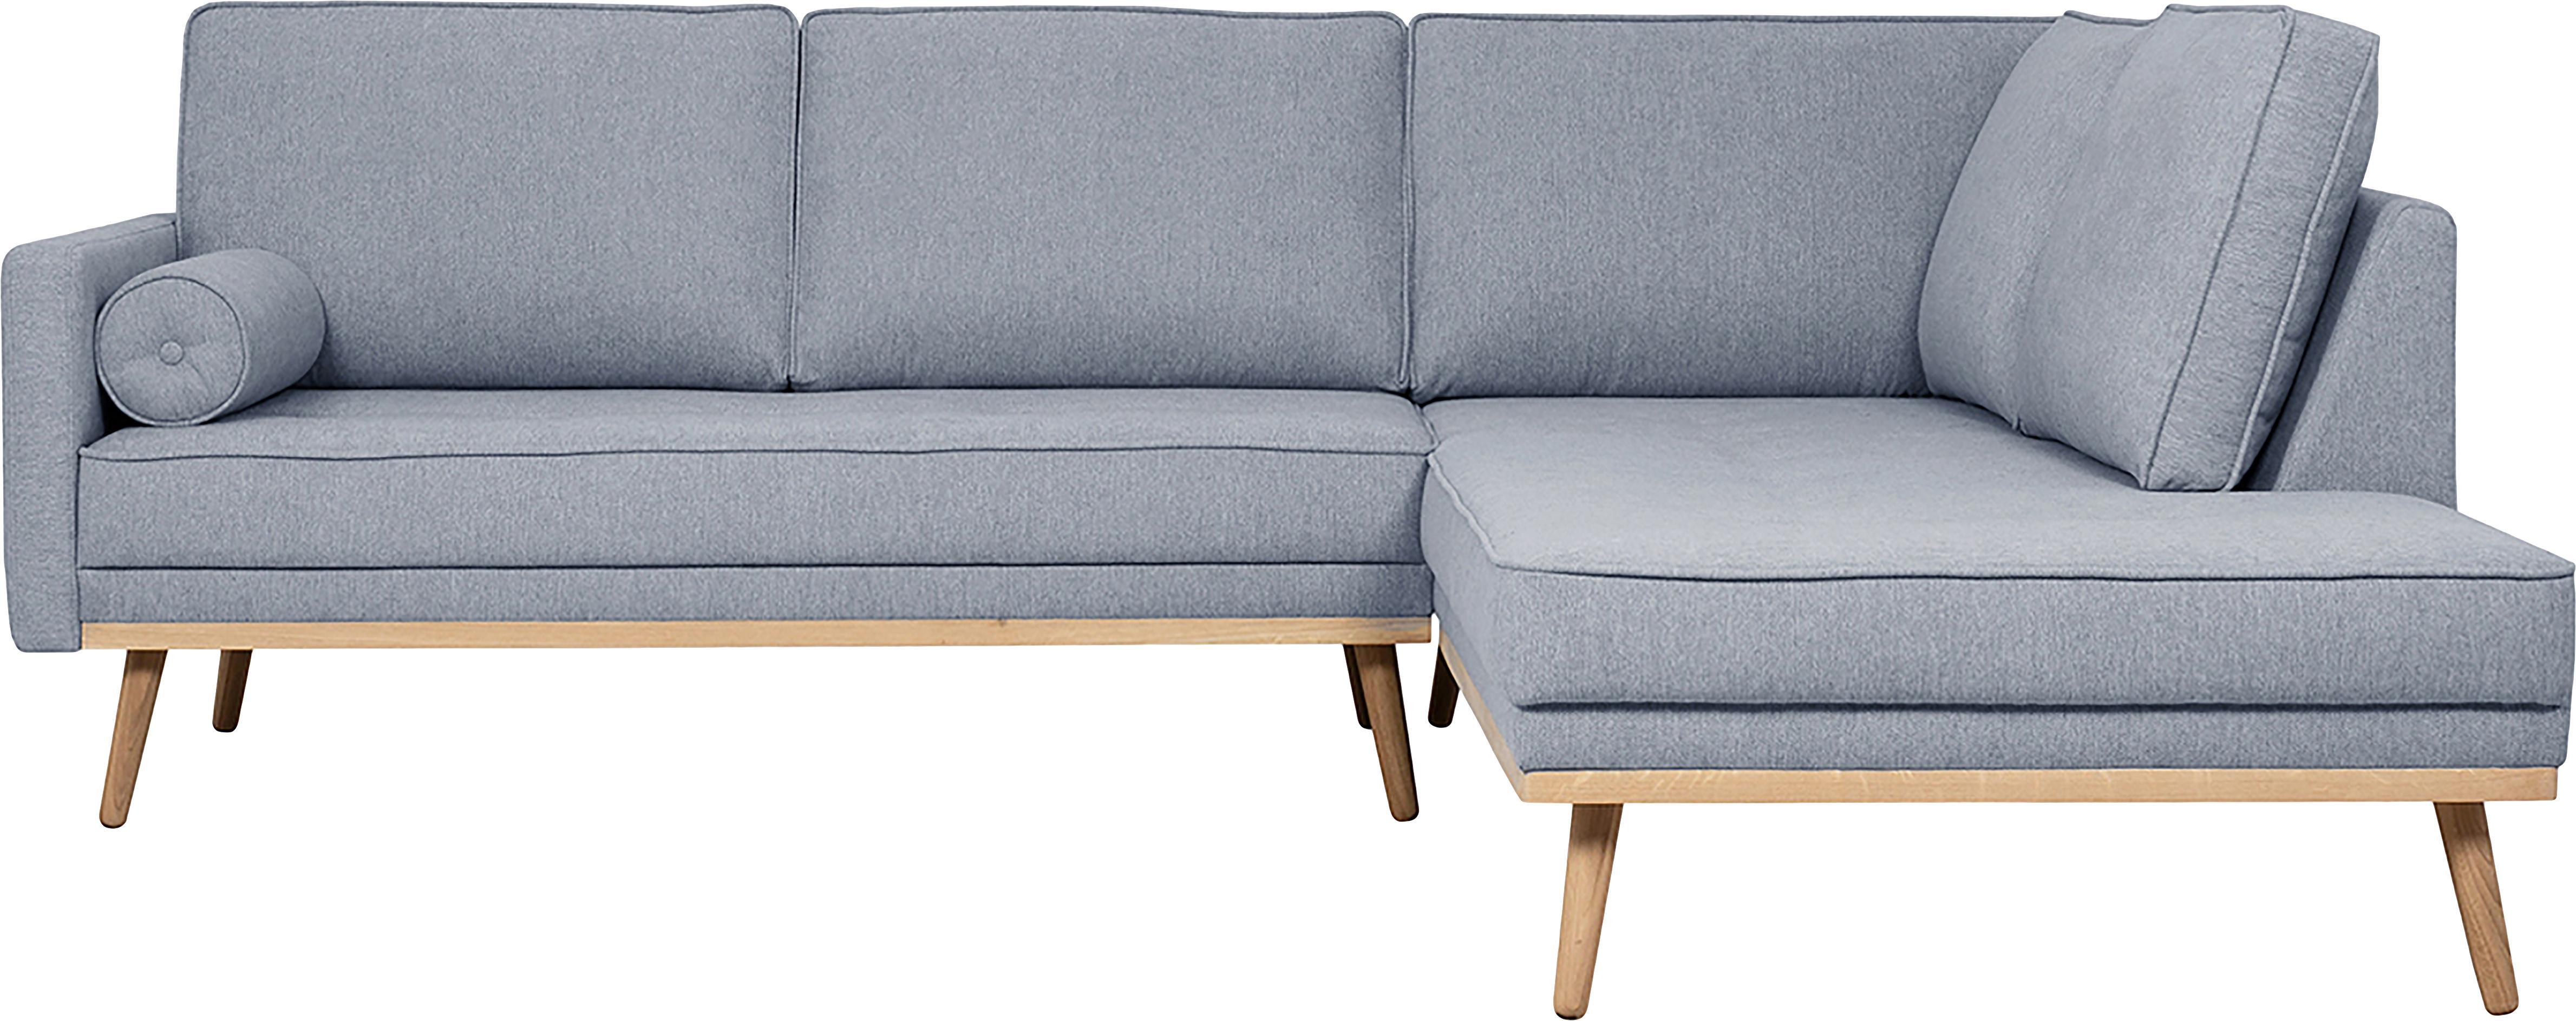 Hoekbank Saint (3-zits), Bekleding: polyester, Frame: massief grenenhout, spaan, Geweven stof blauwgrijs, 243 x 70 cm